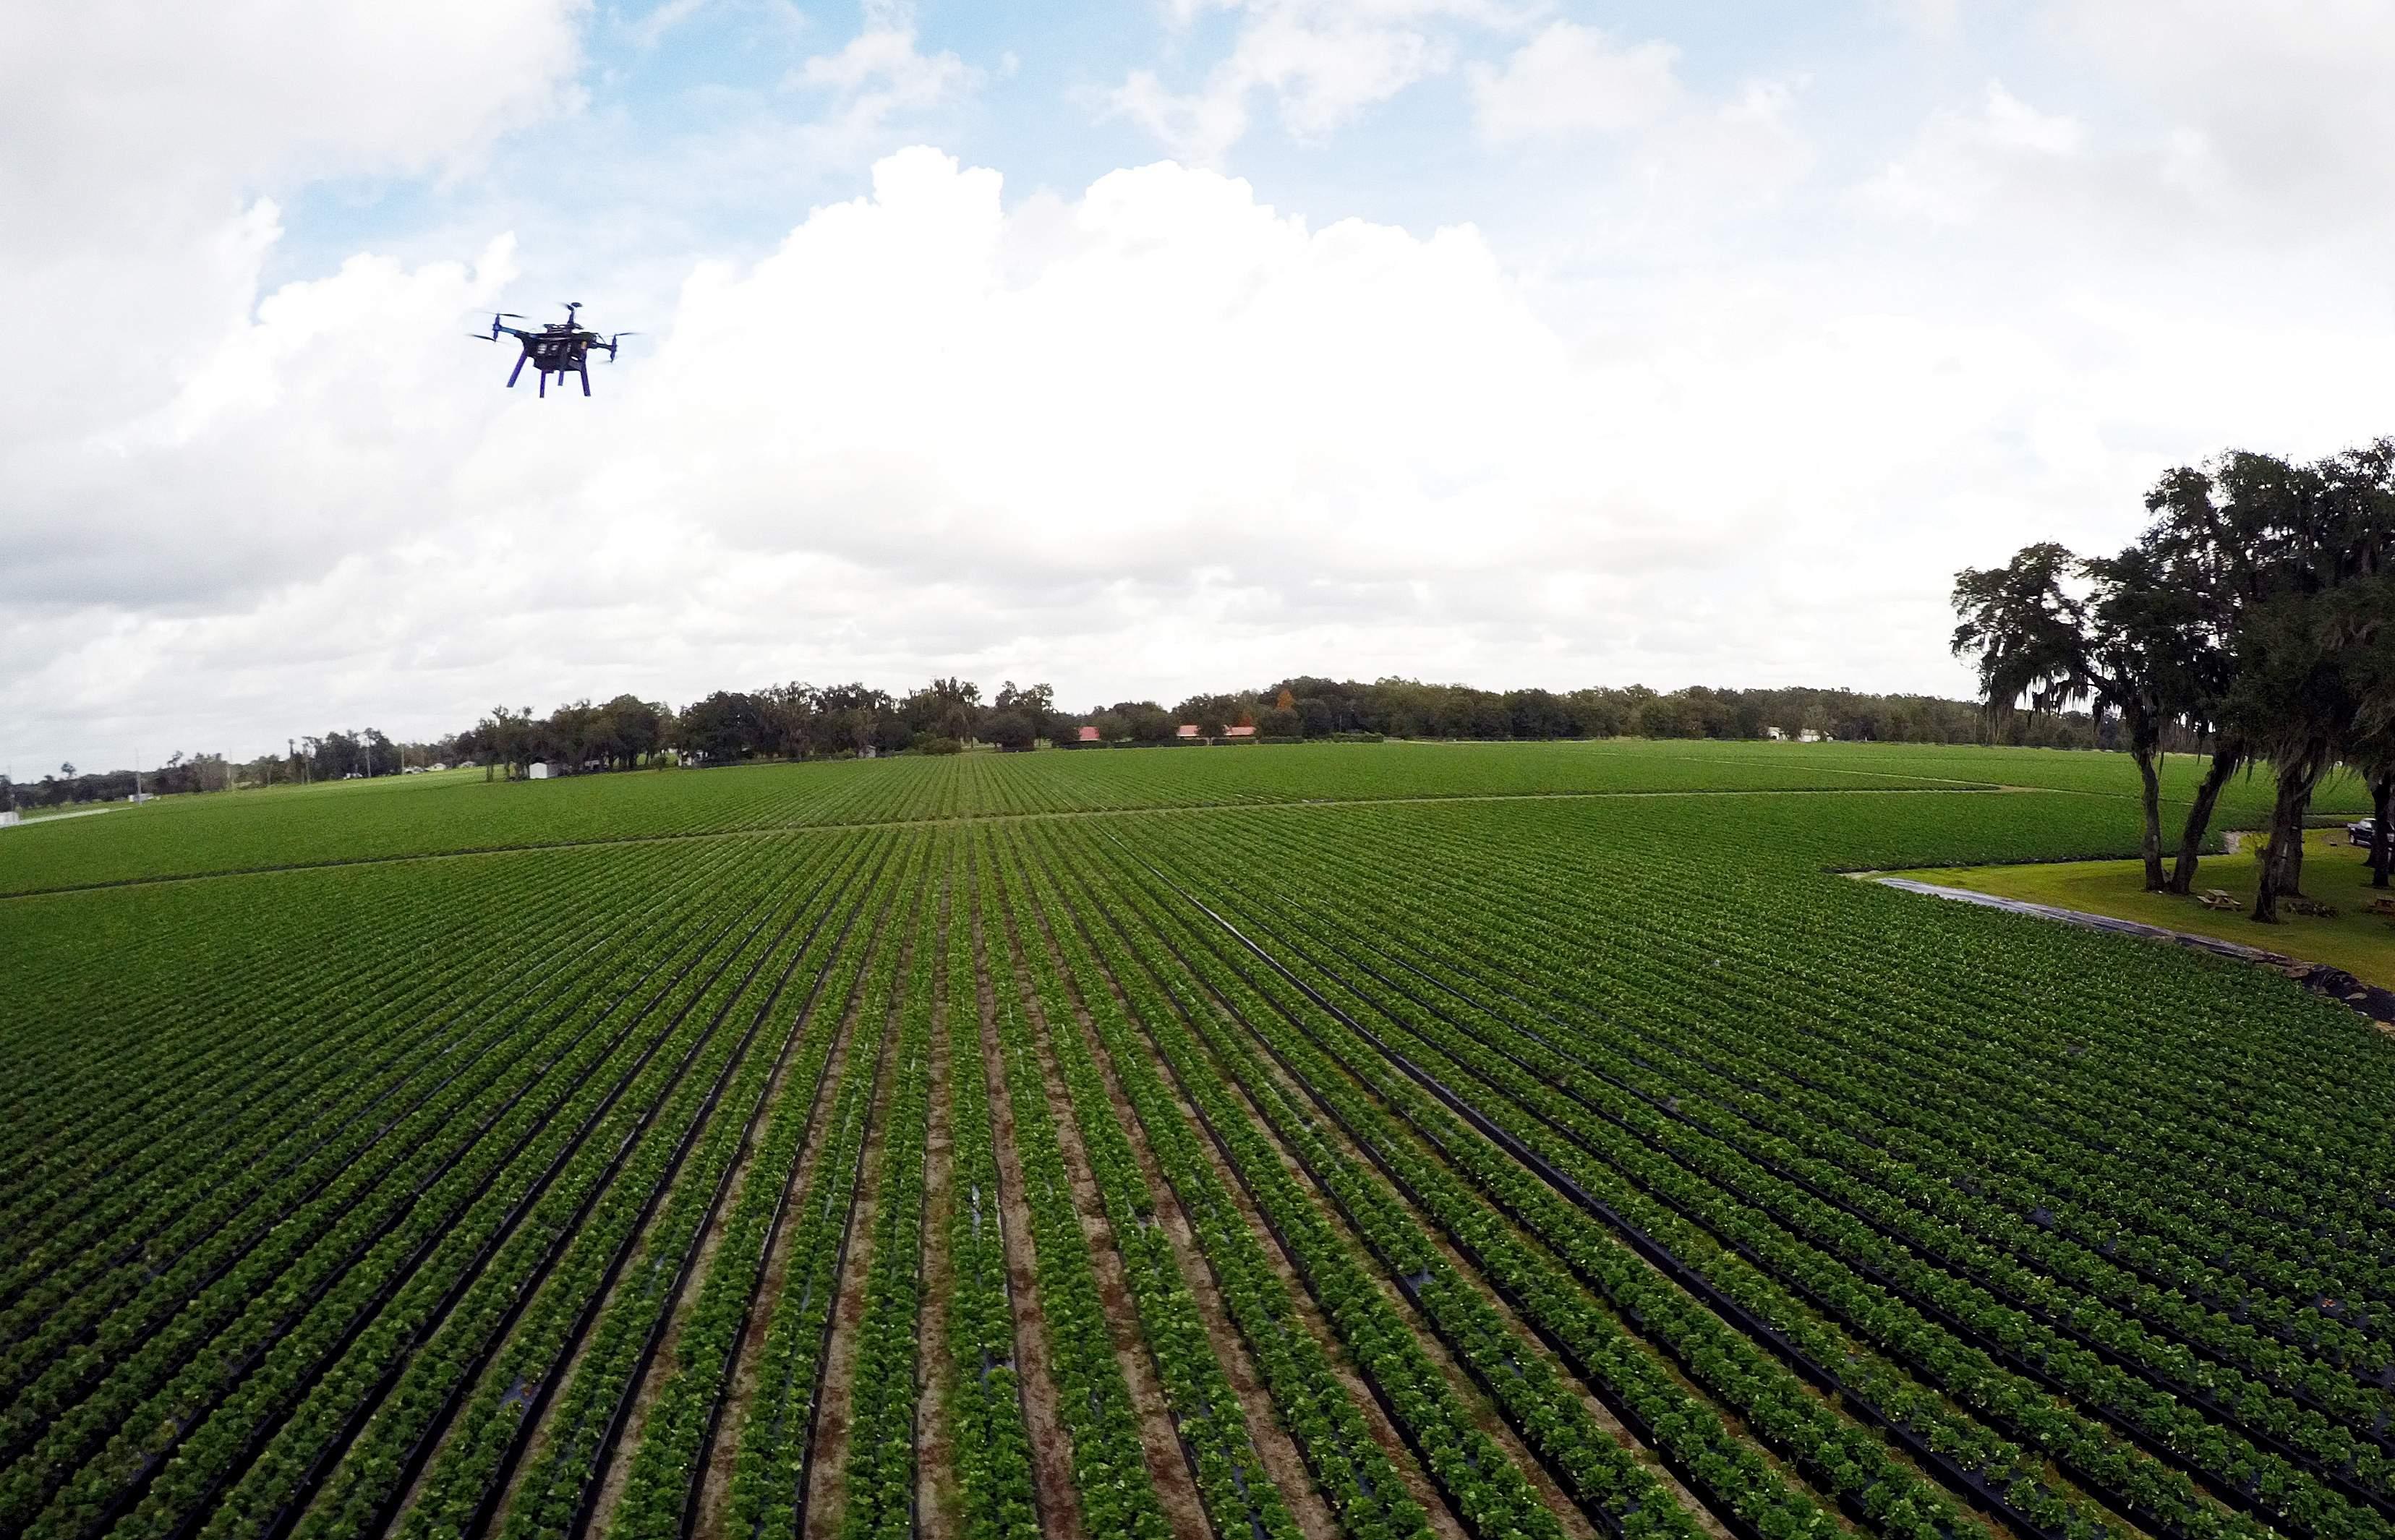 AR-151229611 Мониторинг дронами